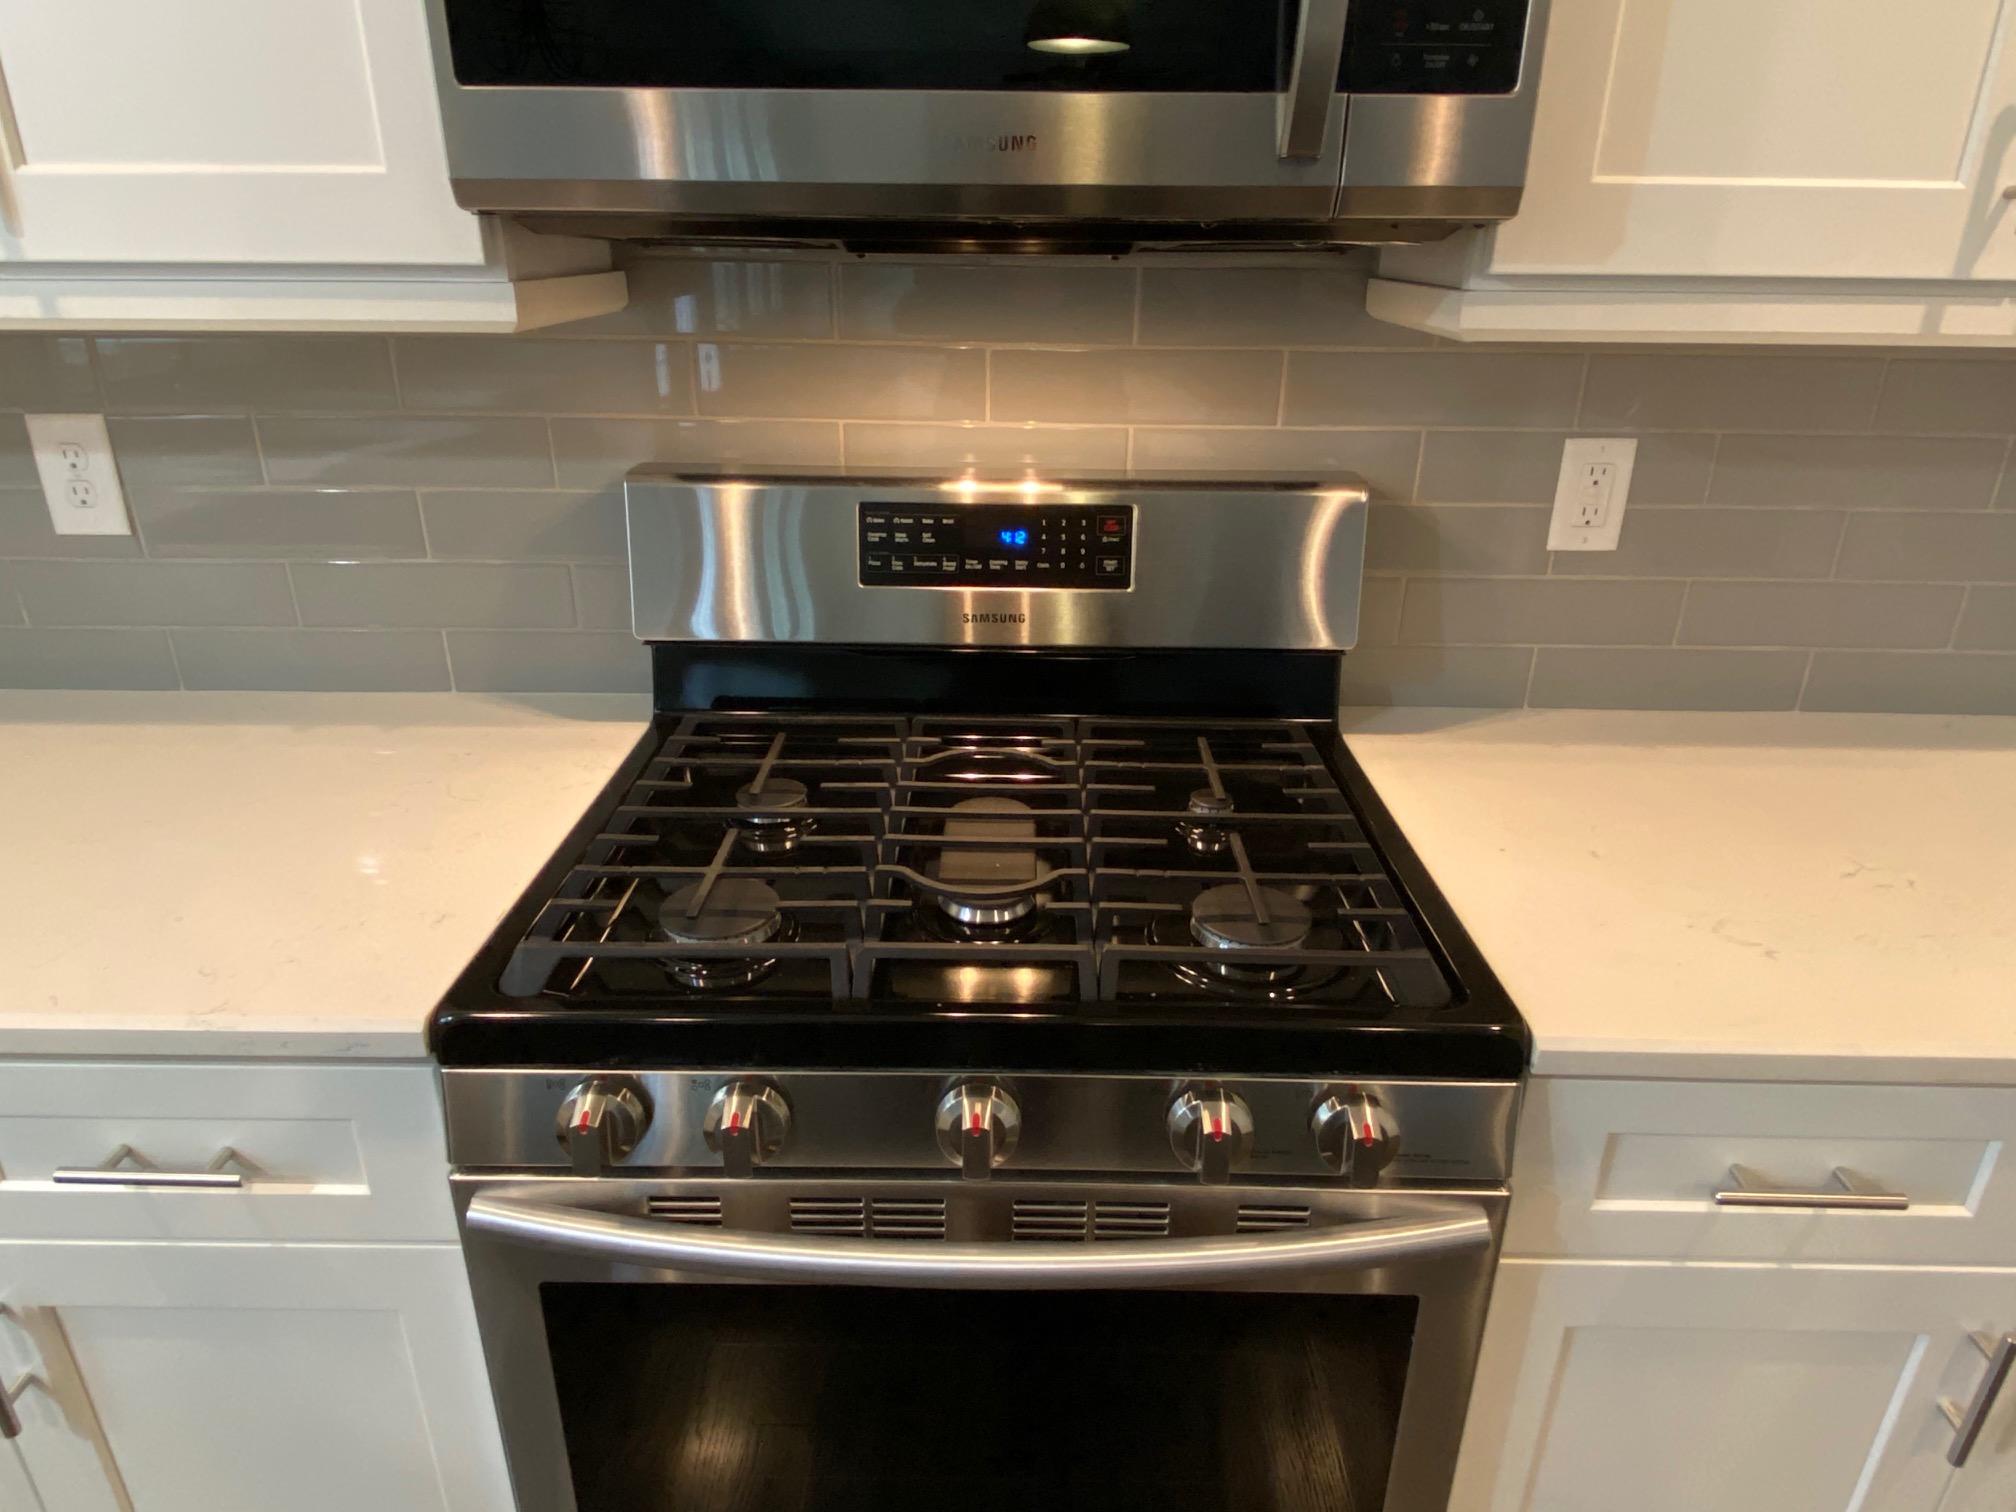 008_High-end-appliances-gas-stove